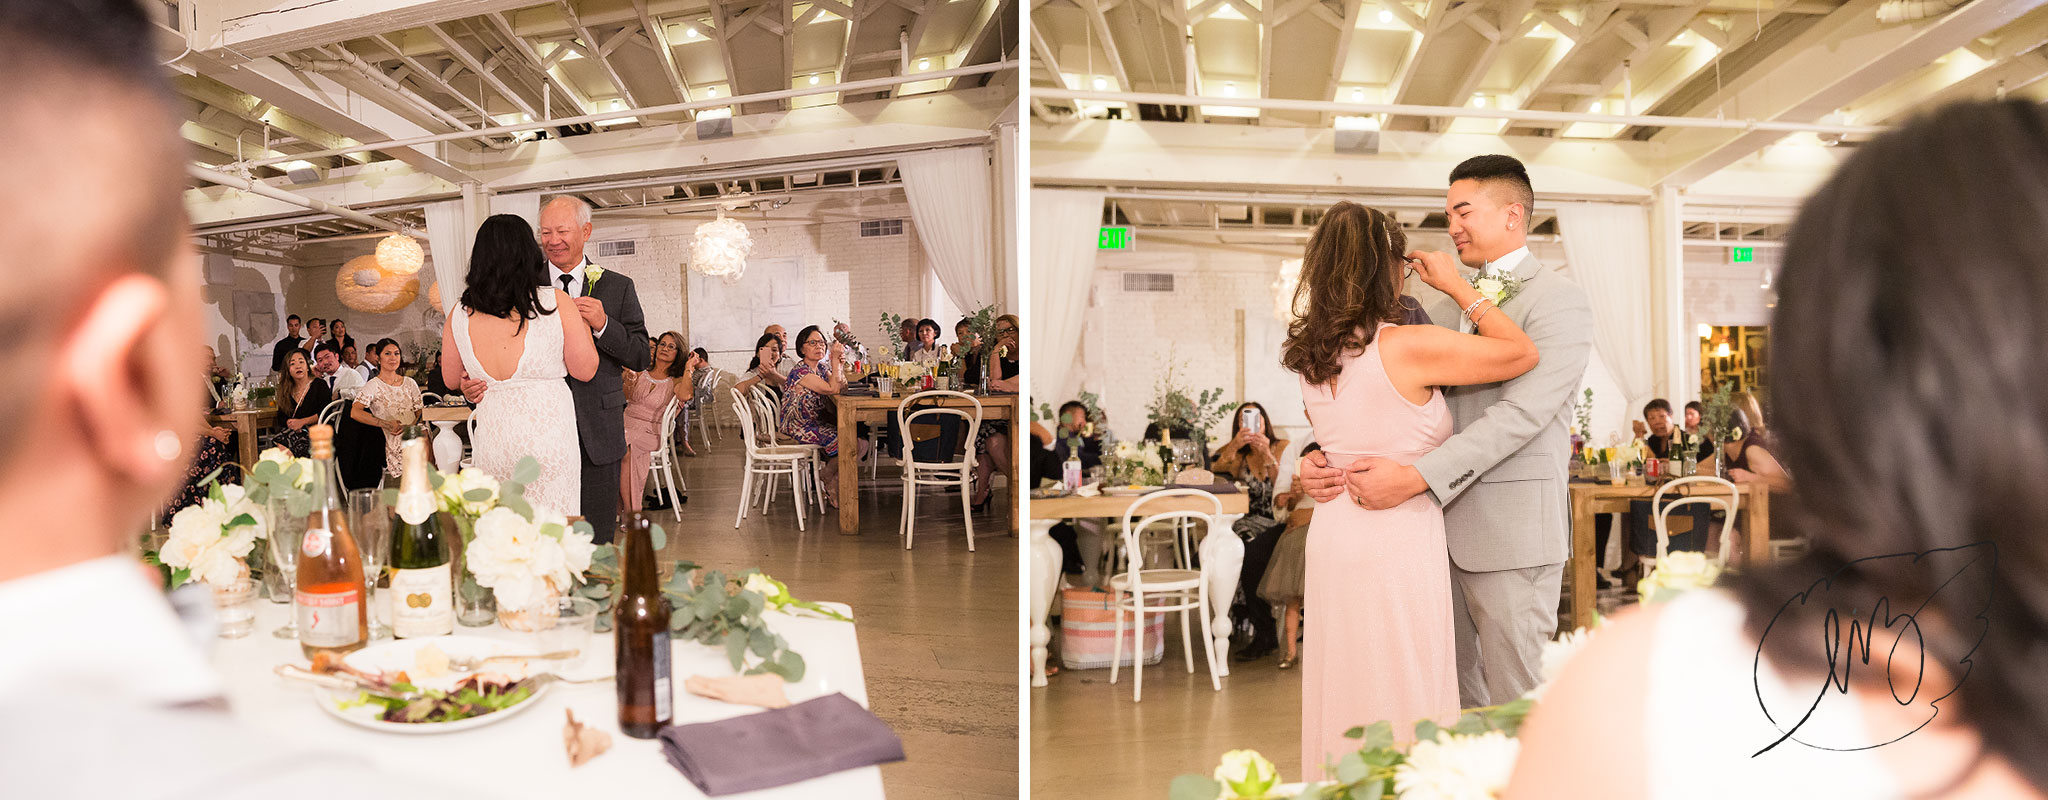 California_Orange_County_Wedding_Photographer_37.jpg